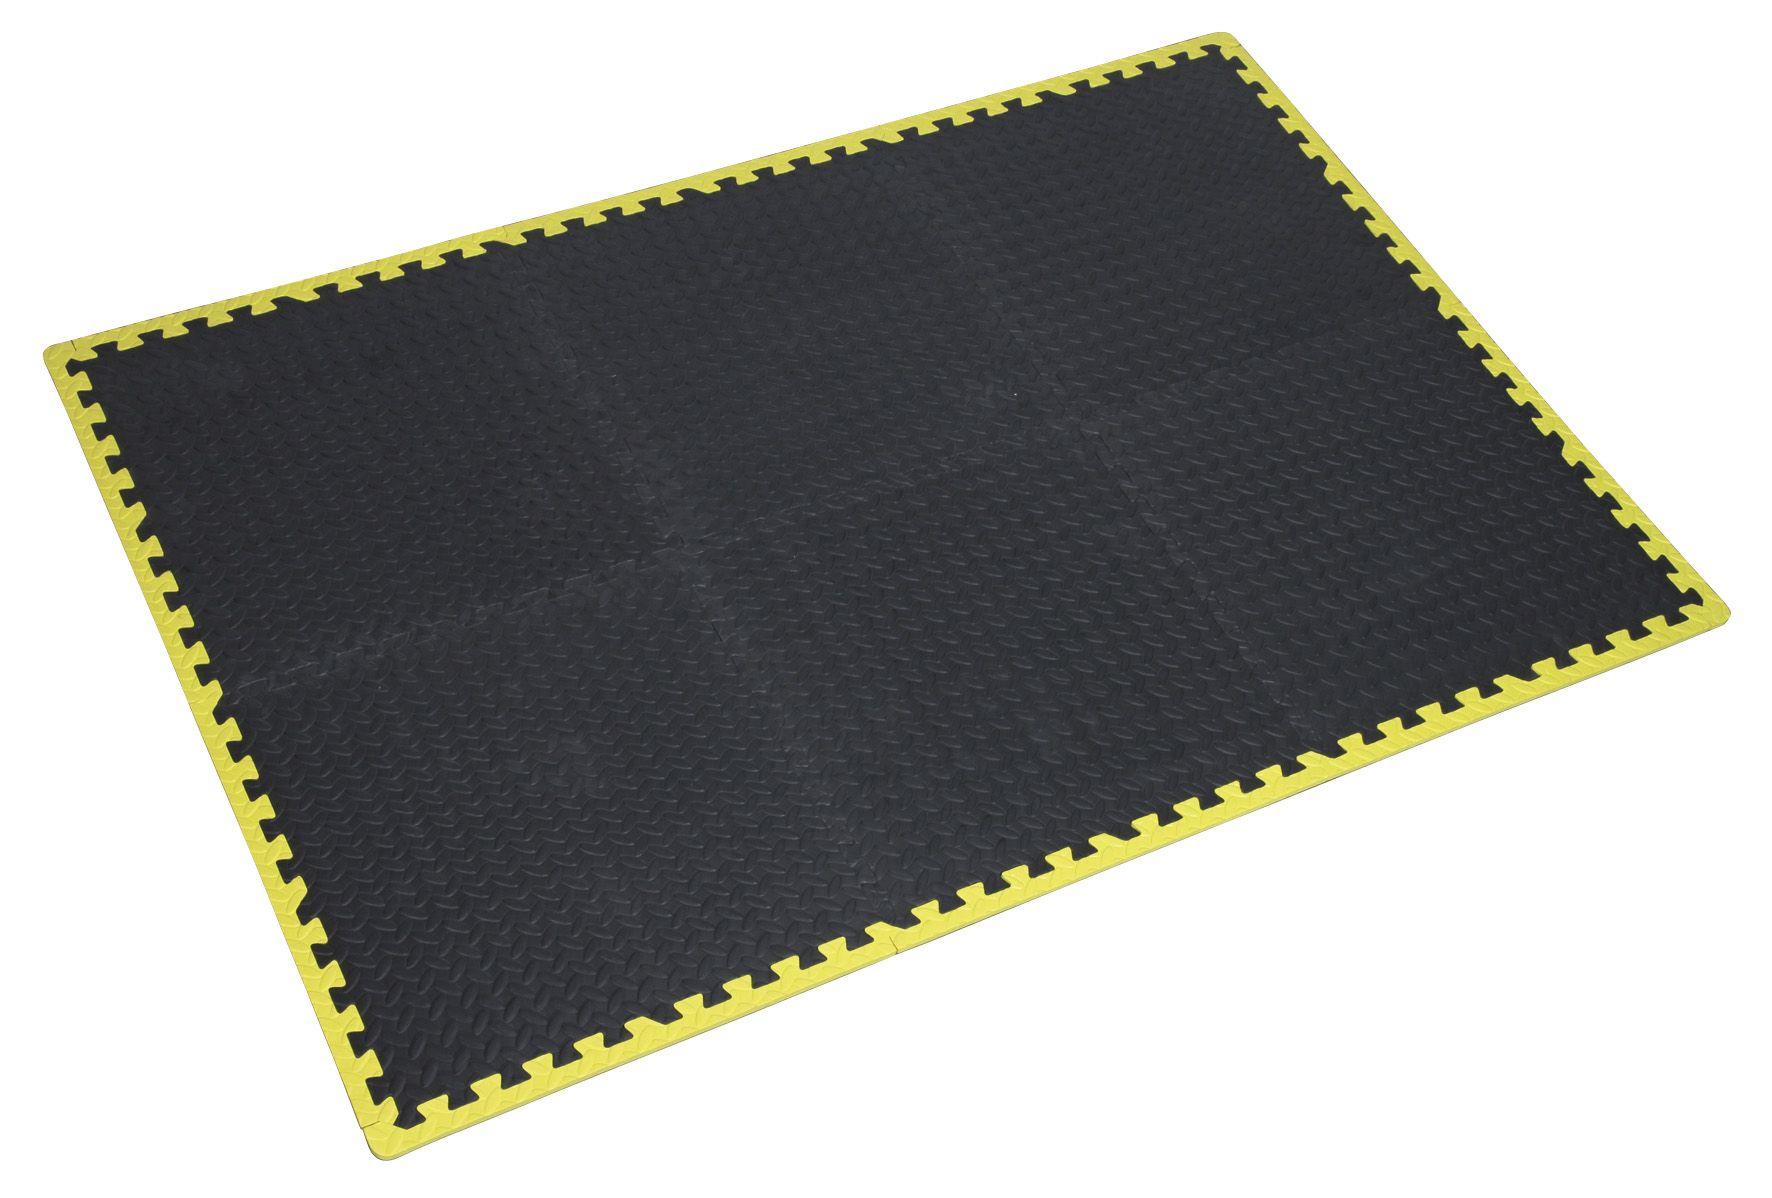 Sealey Interlocking EVA Foam Workshop Mat Set 1240 x 1825mm with Hi-Vis Edges